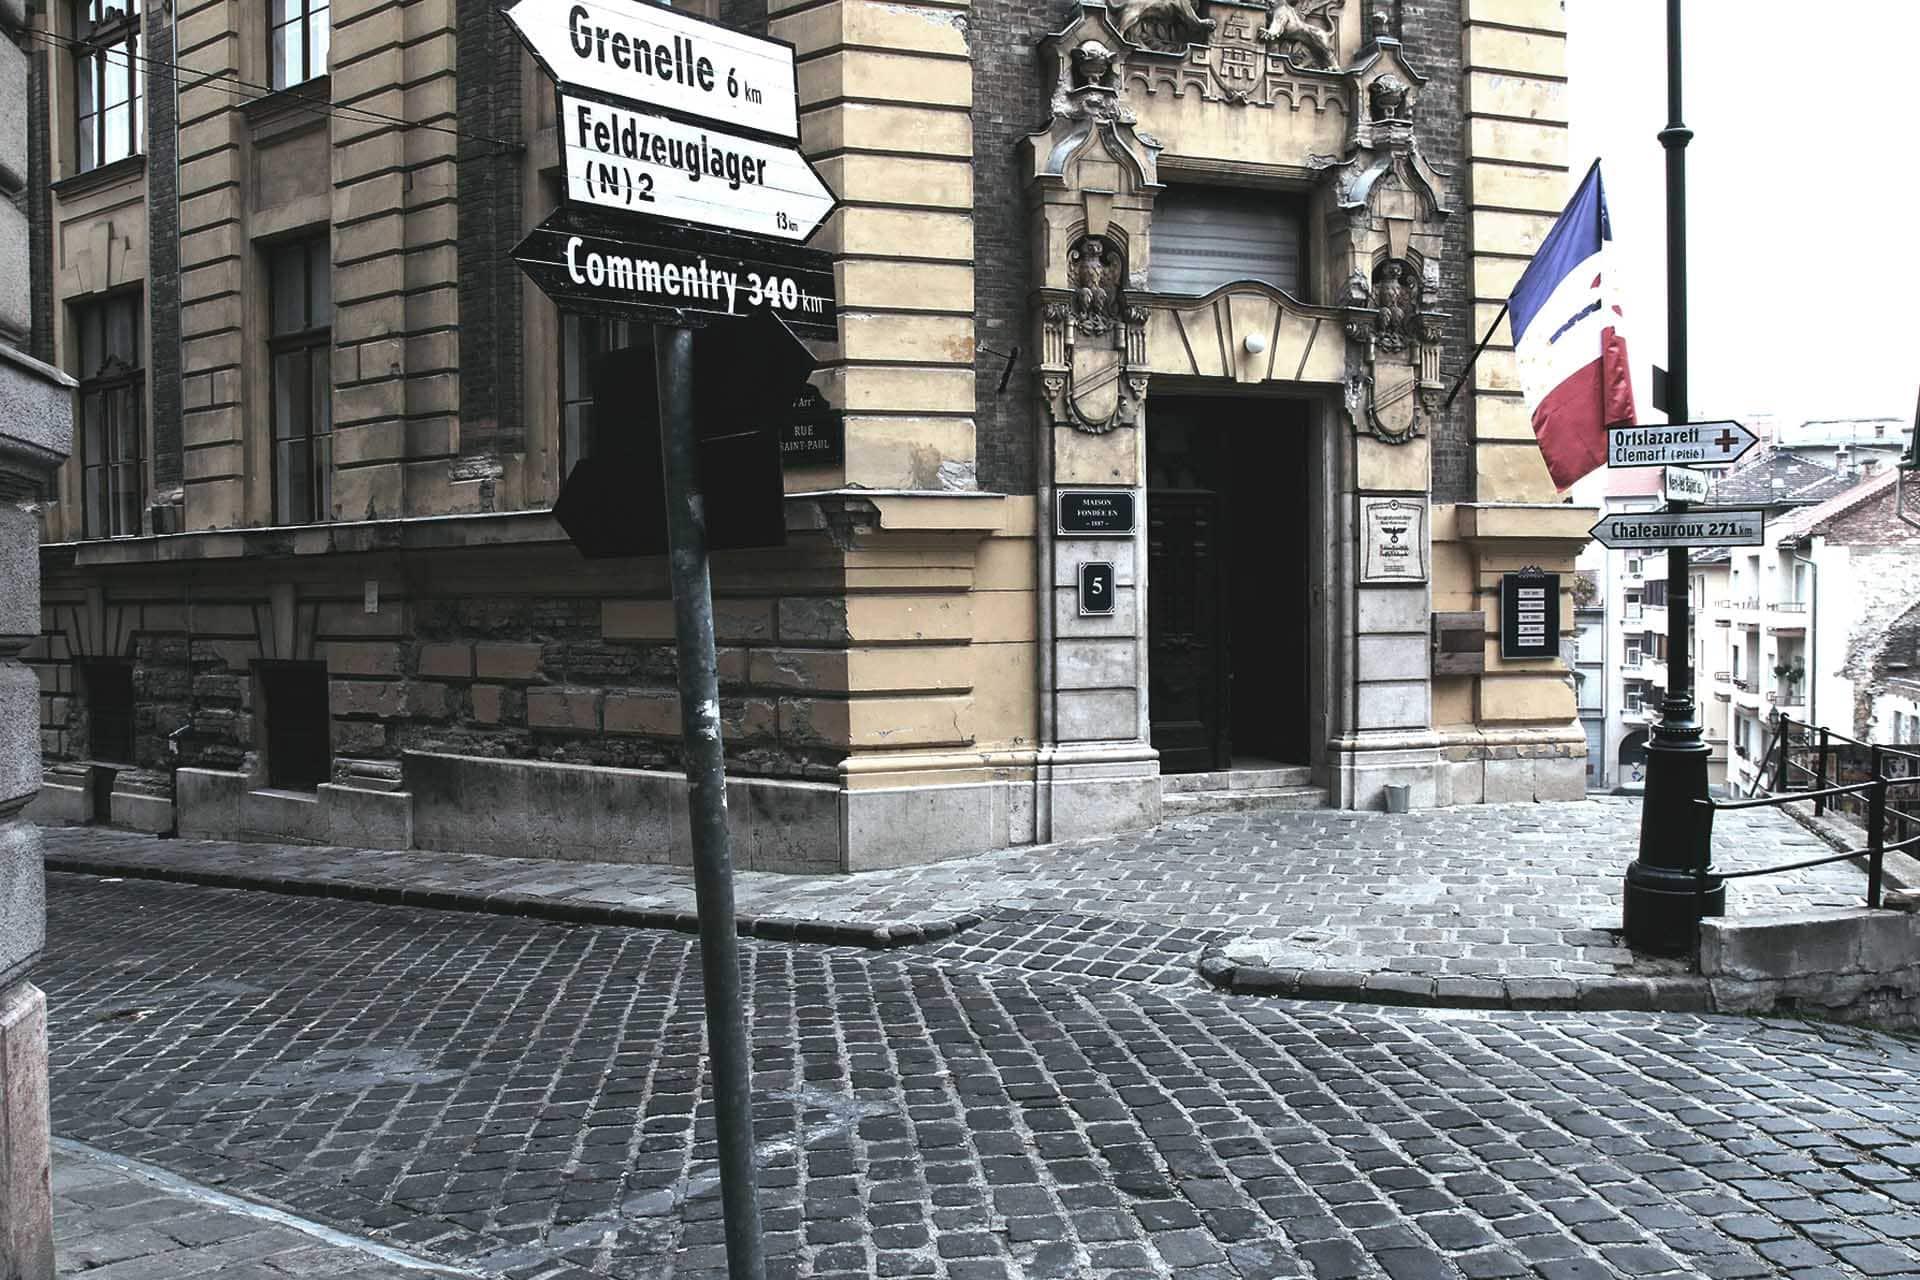 Streets-of-Paris - Episode 8